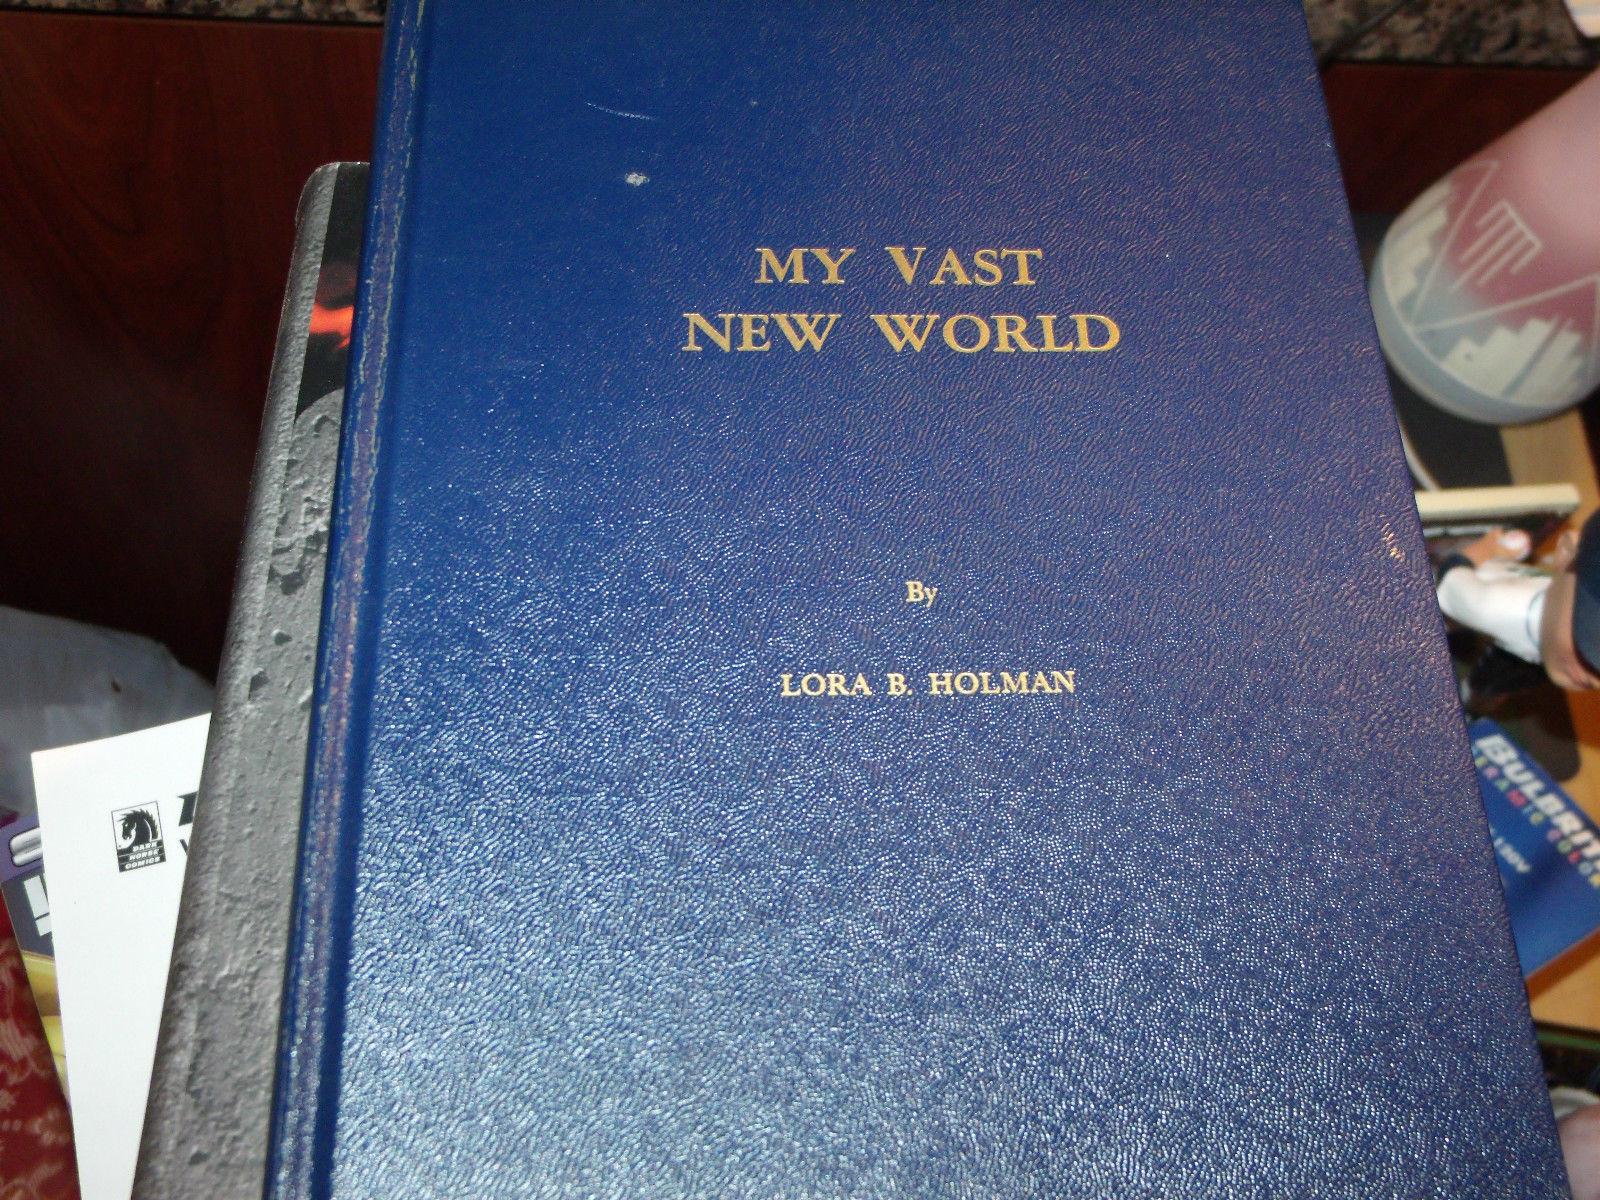 MY VAST NEW WORLD SIGNED BY LORA B HOLMAN 1ST EDITION